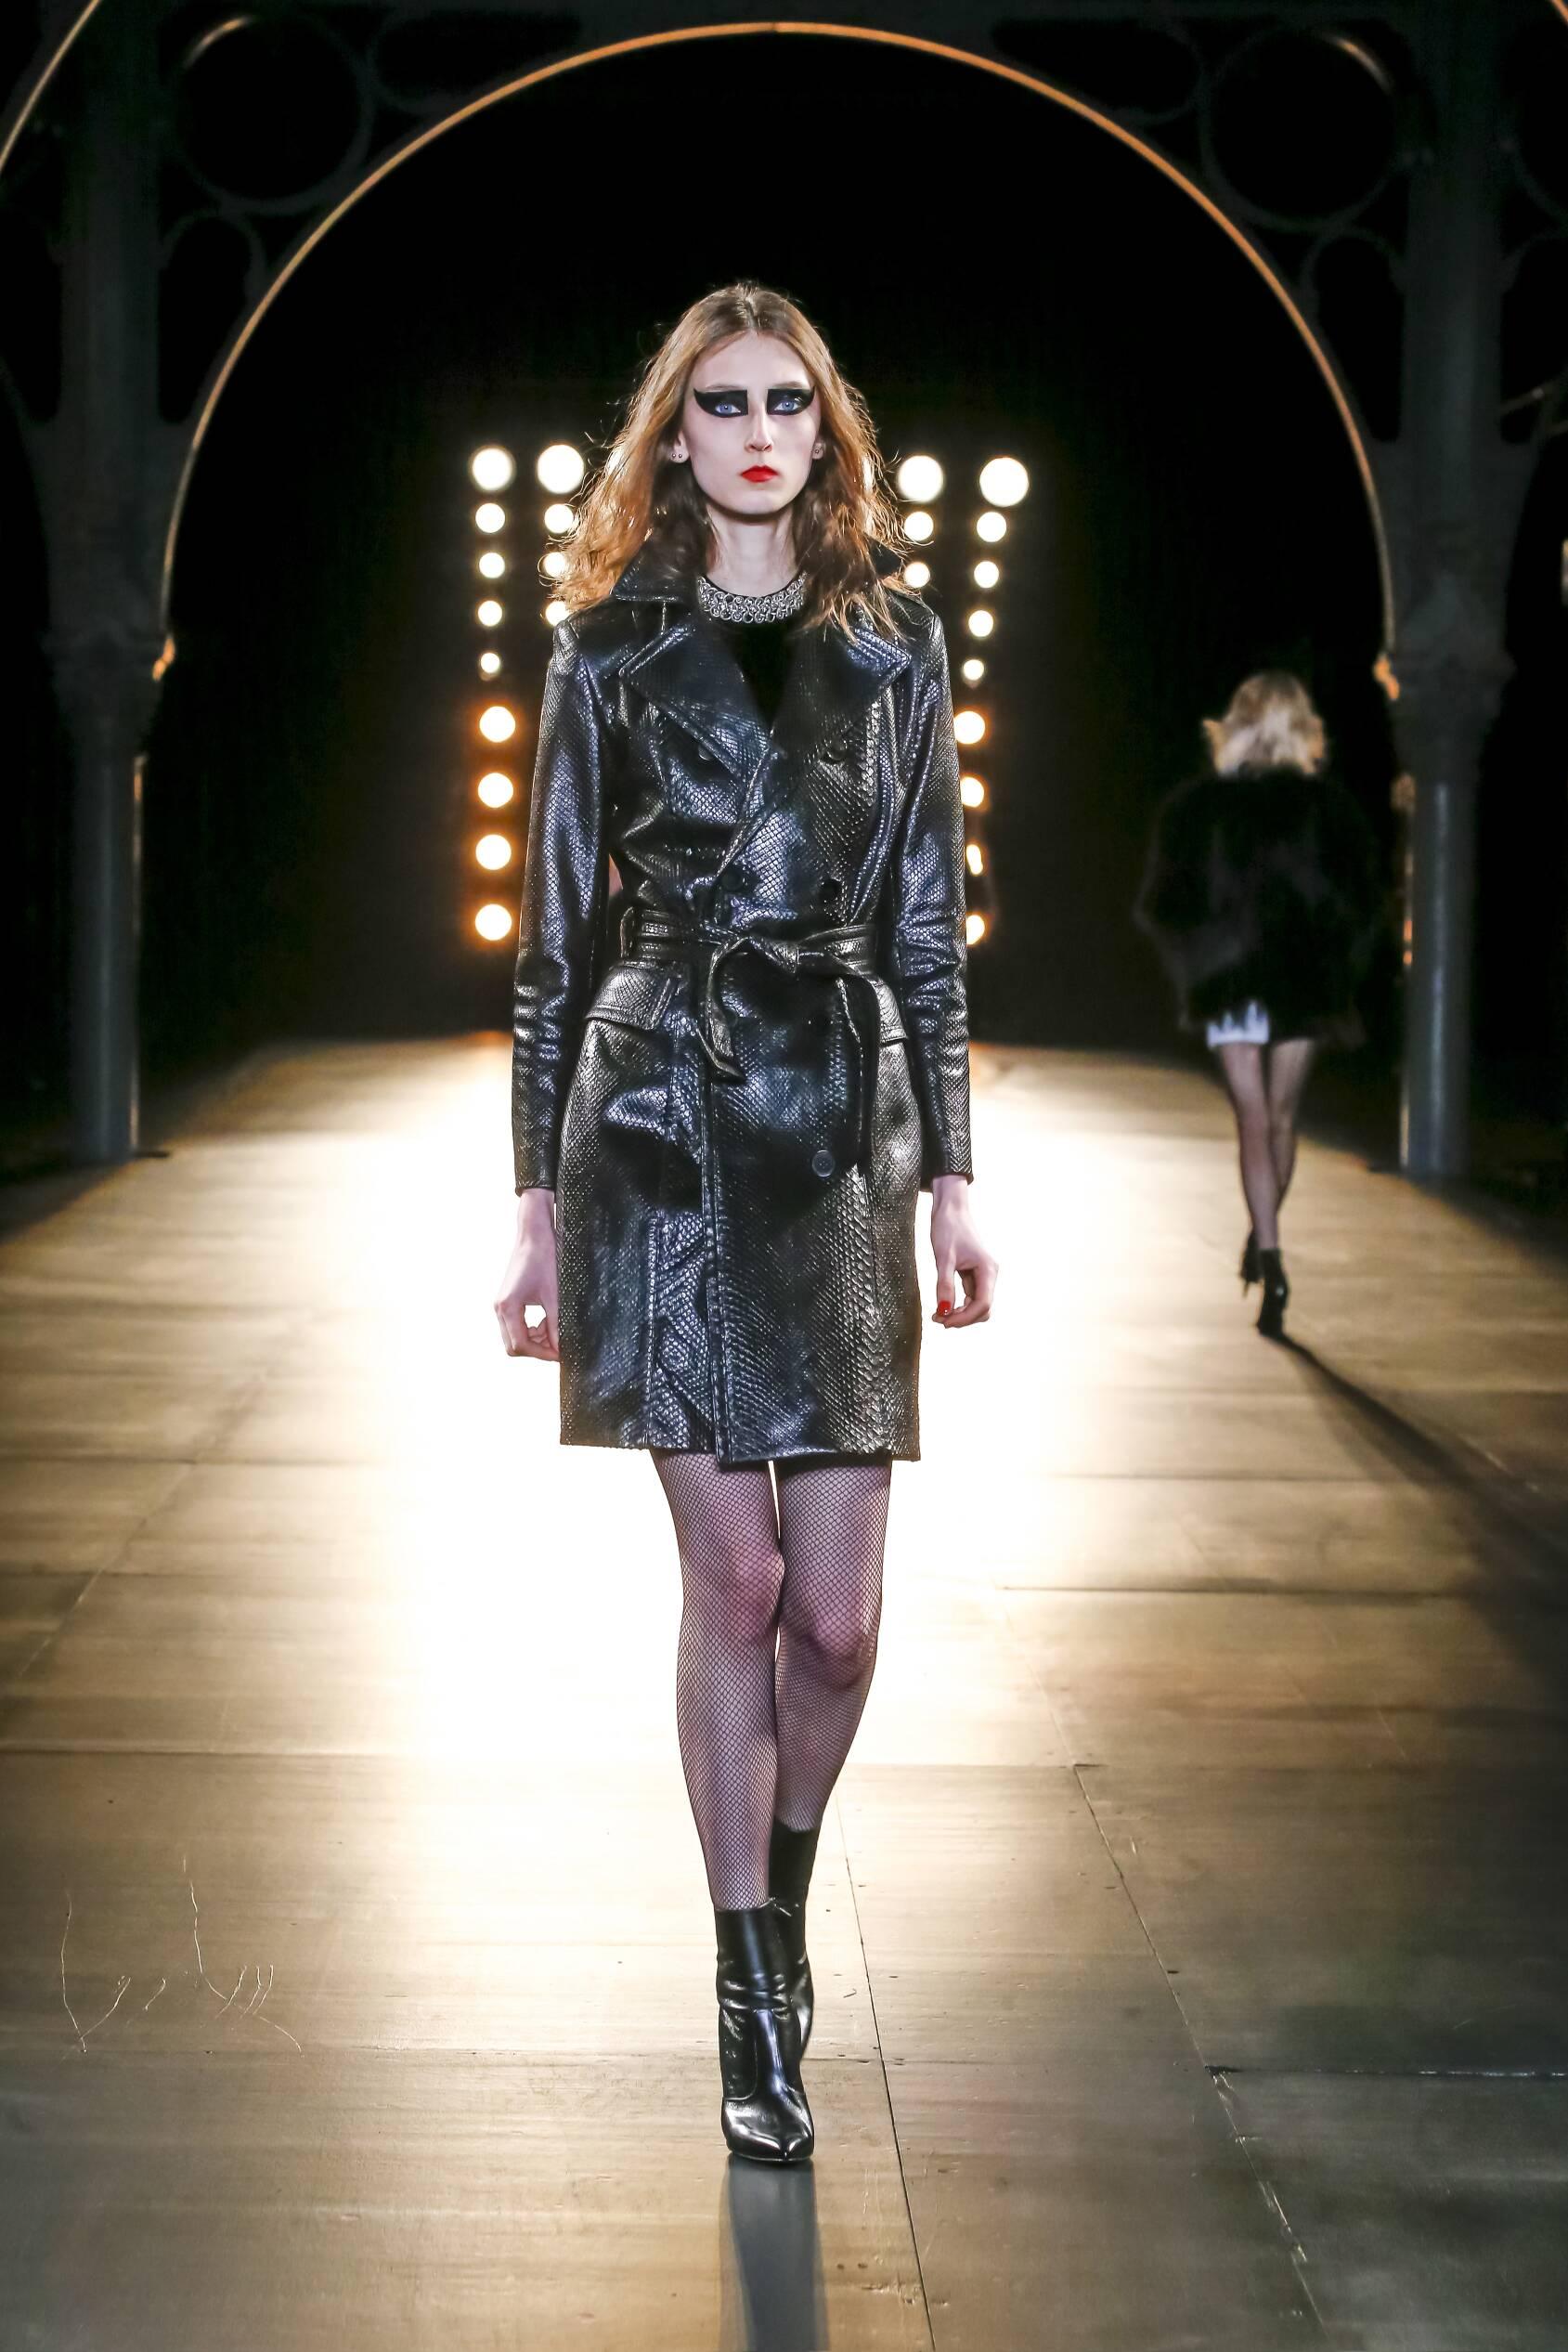 Catwalk Saint Laurent Fall Winter 2015 16 Women's Collection Paris Fashion Week